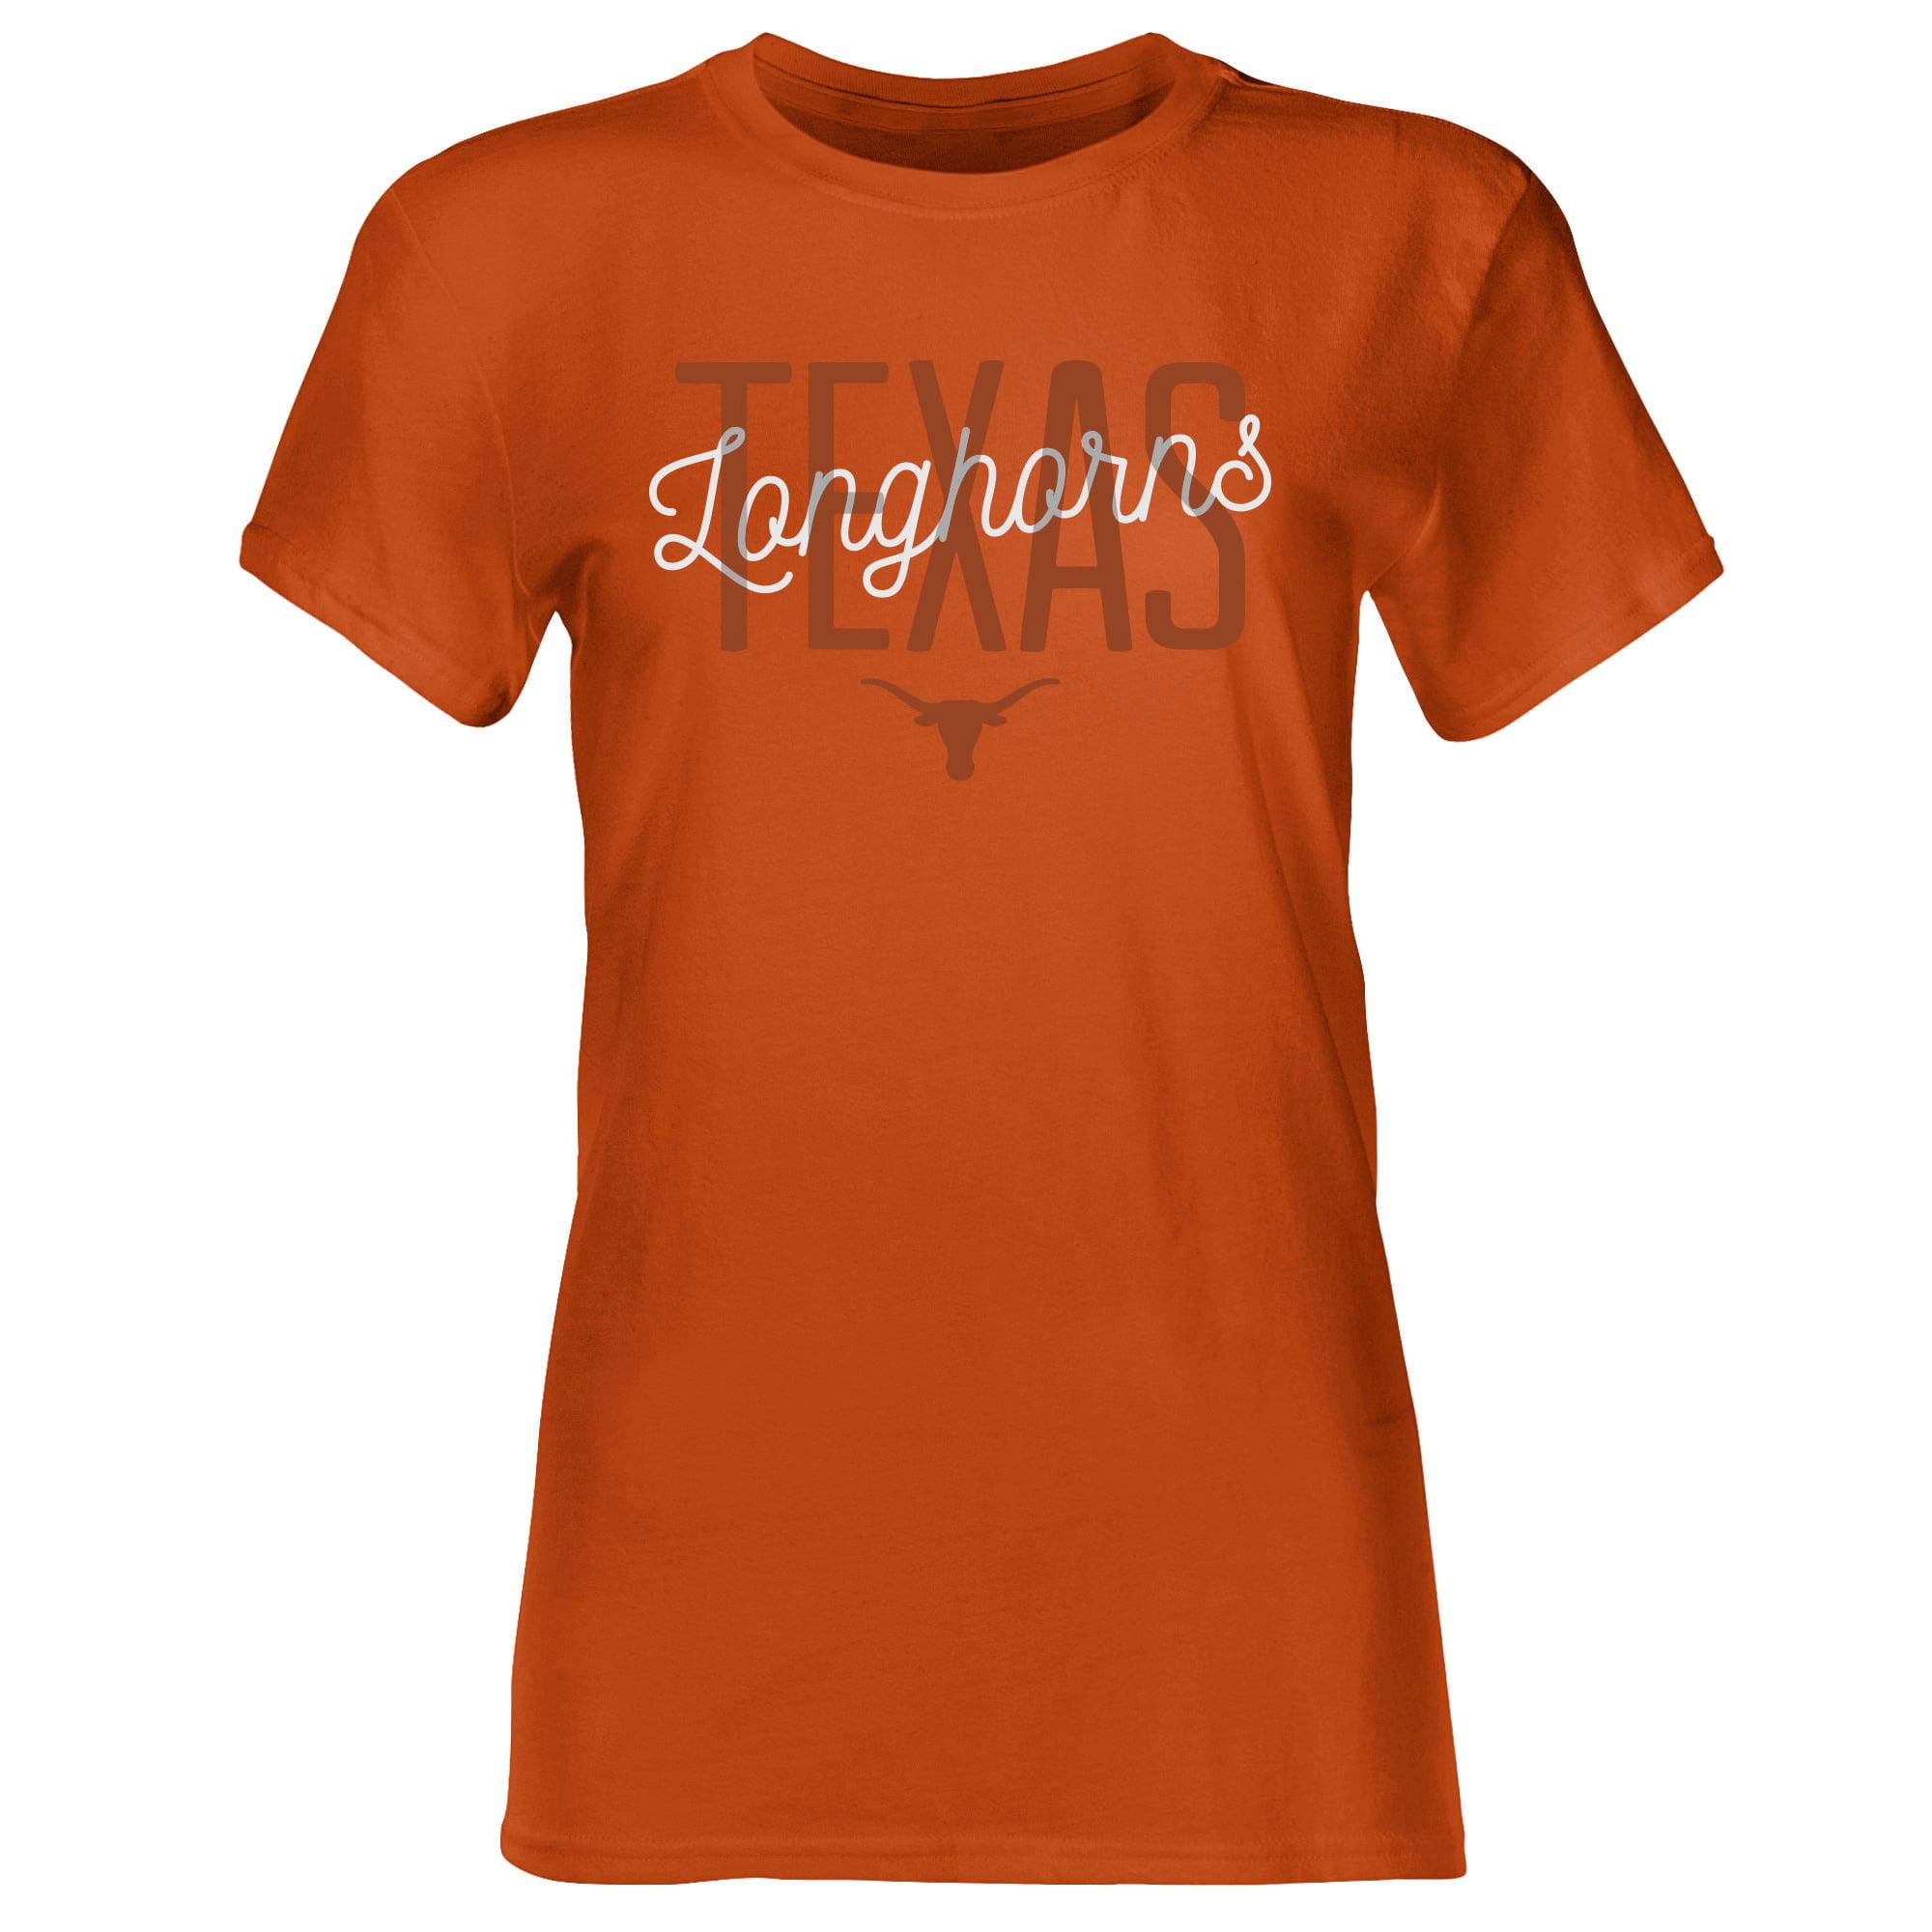 Women's Burnt Texas Orange Texas Longhorns Zarcero Crew Neck T-Shirt